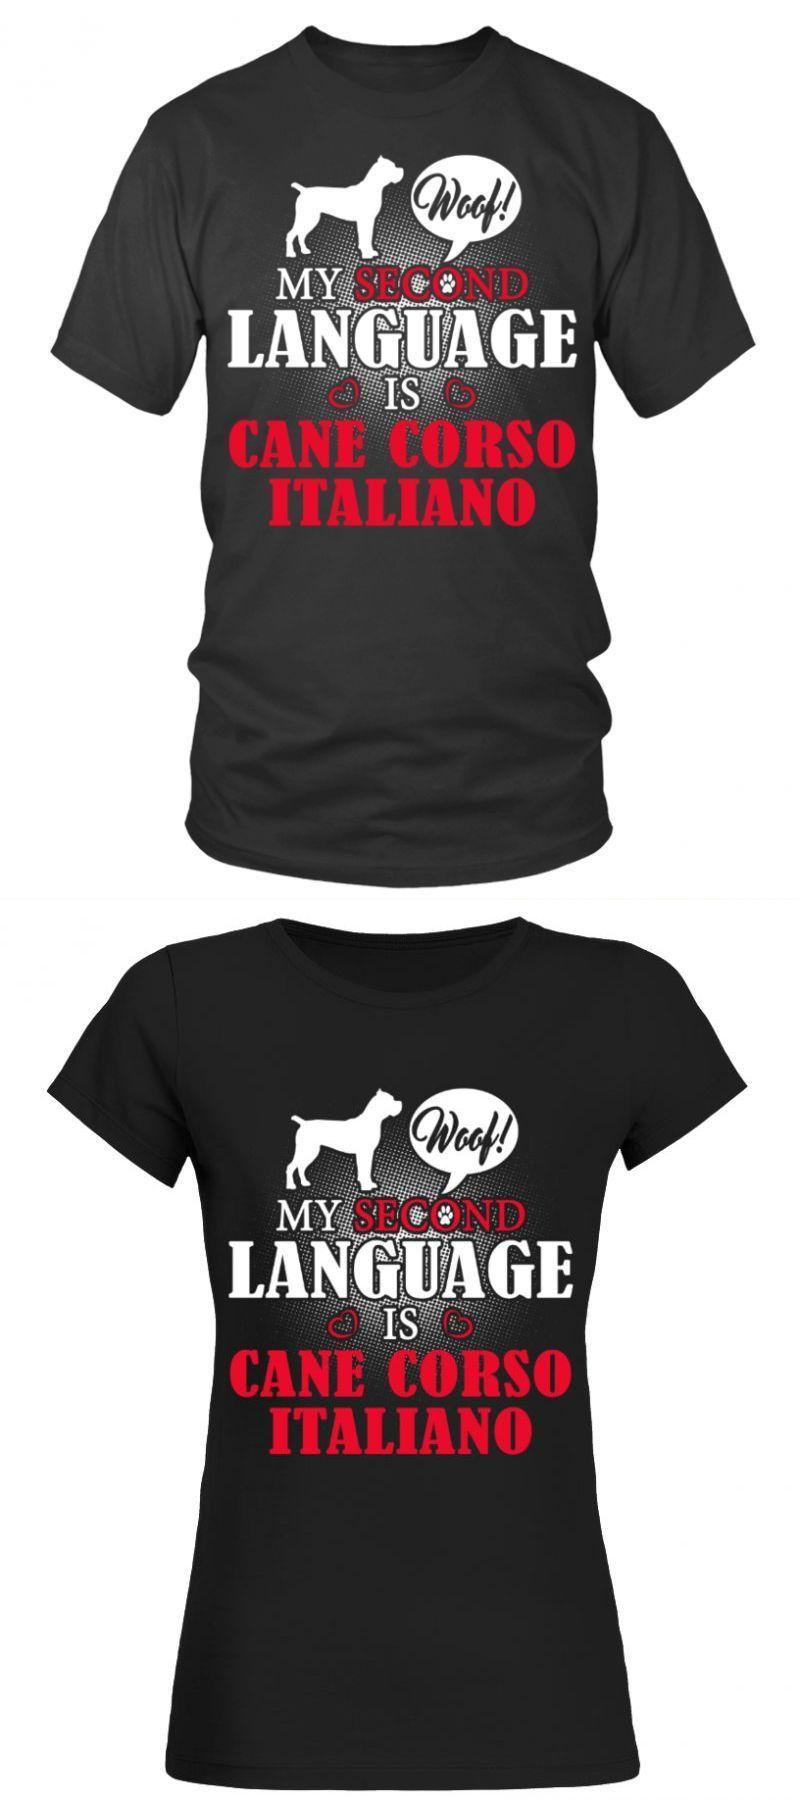 Cow T Shirt Company Cane Corso Italiano Funny T Shirt Cow Print T